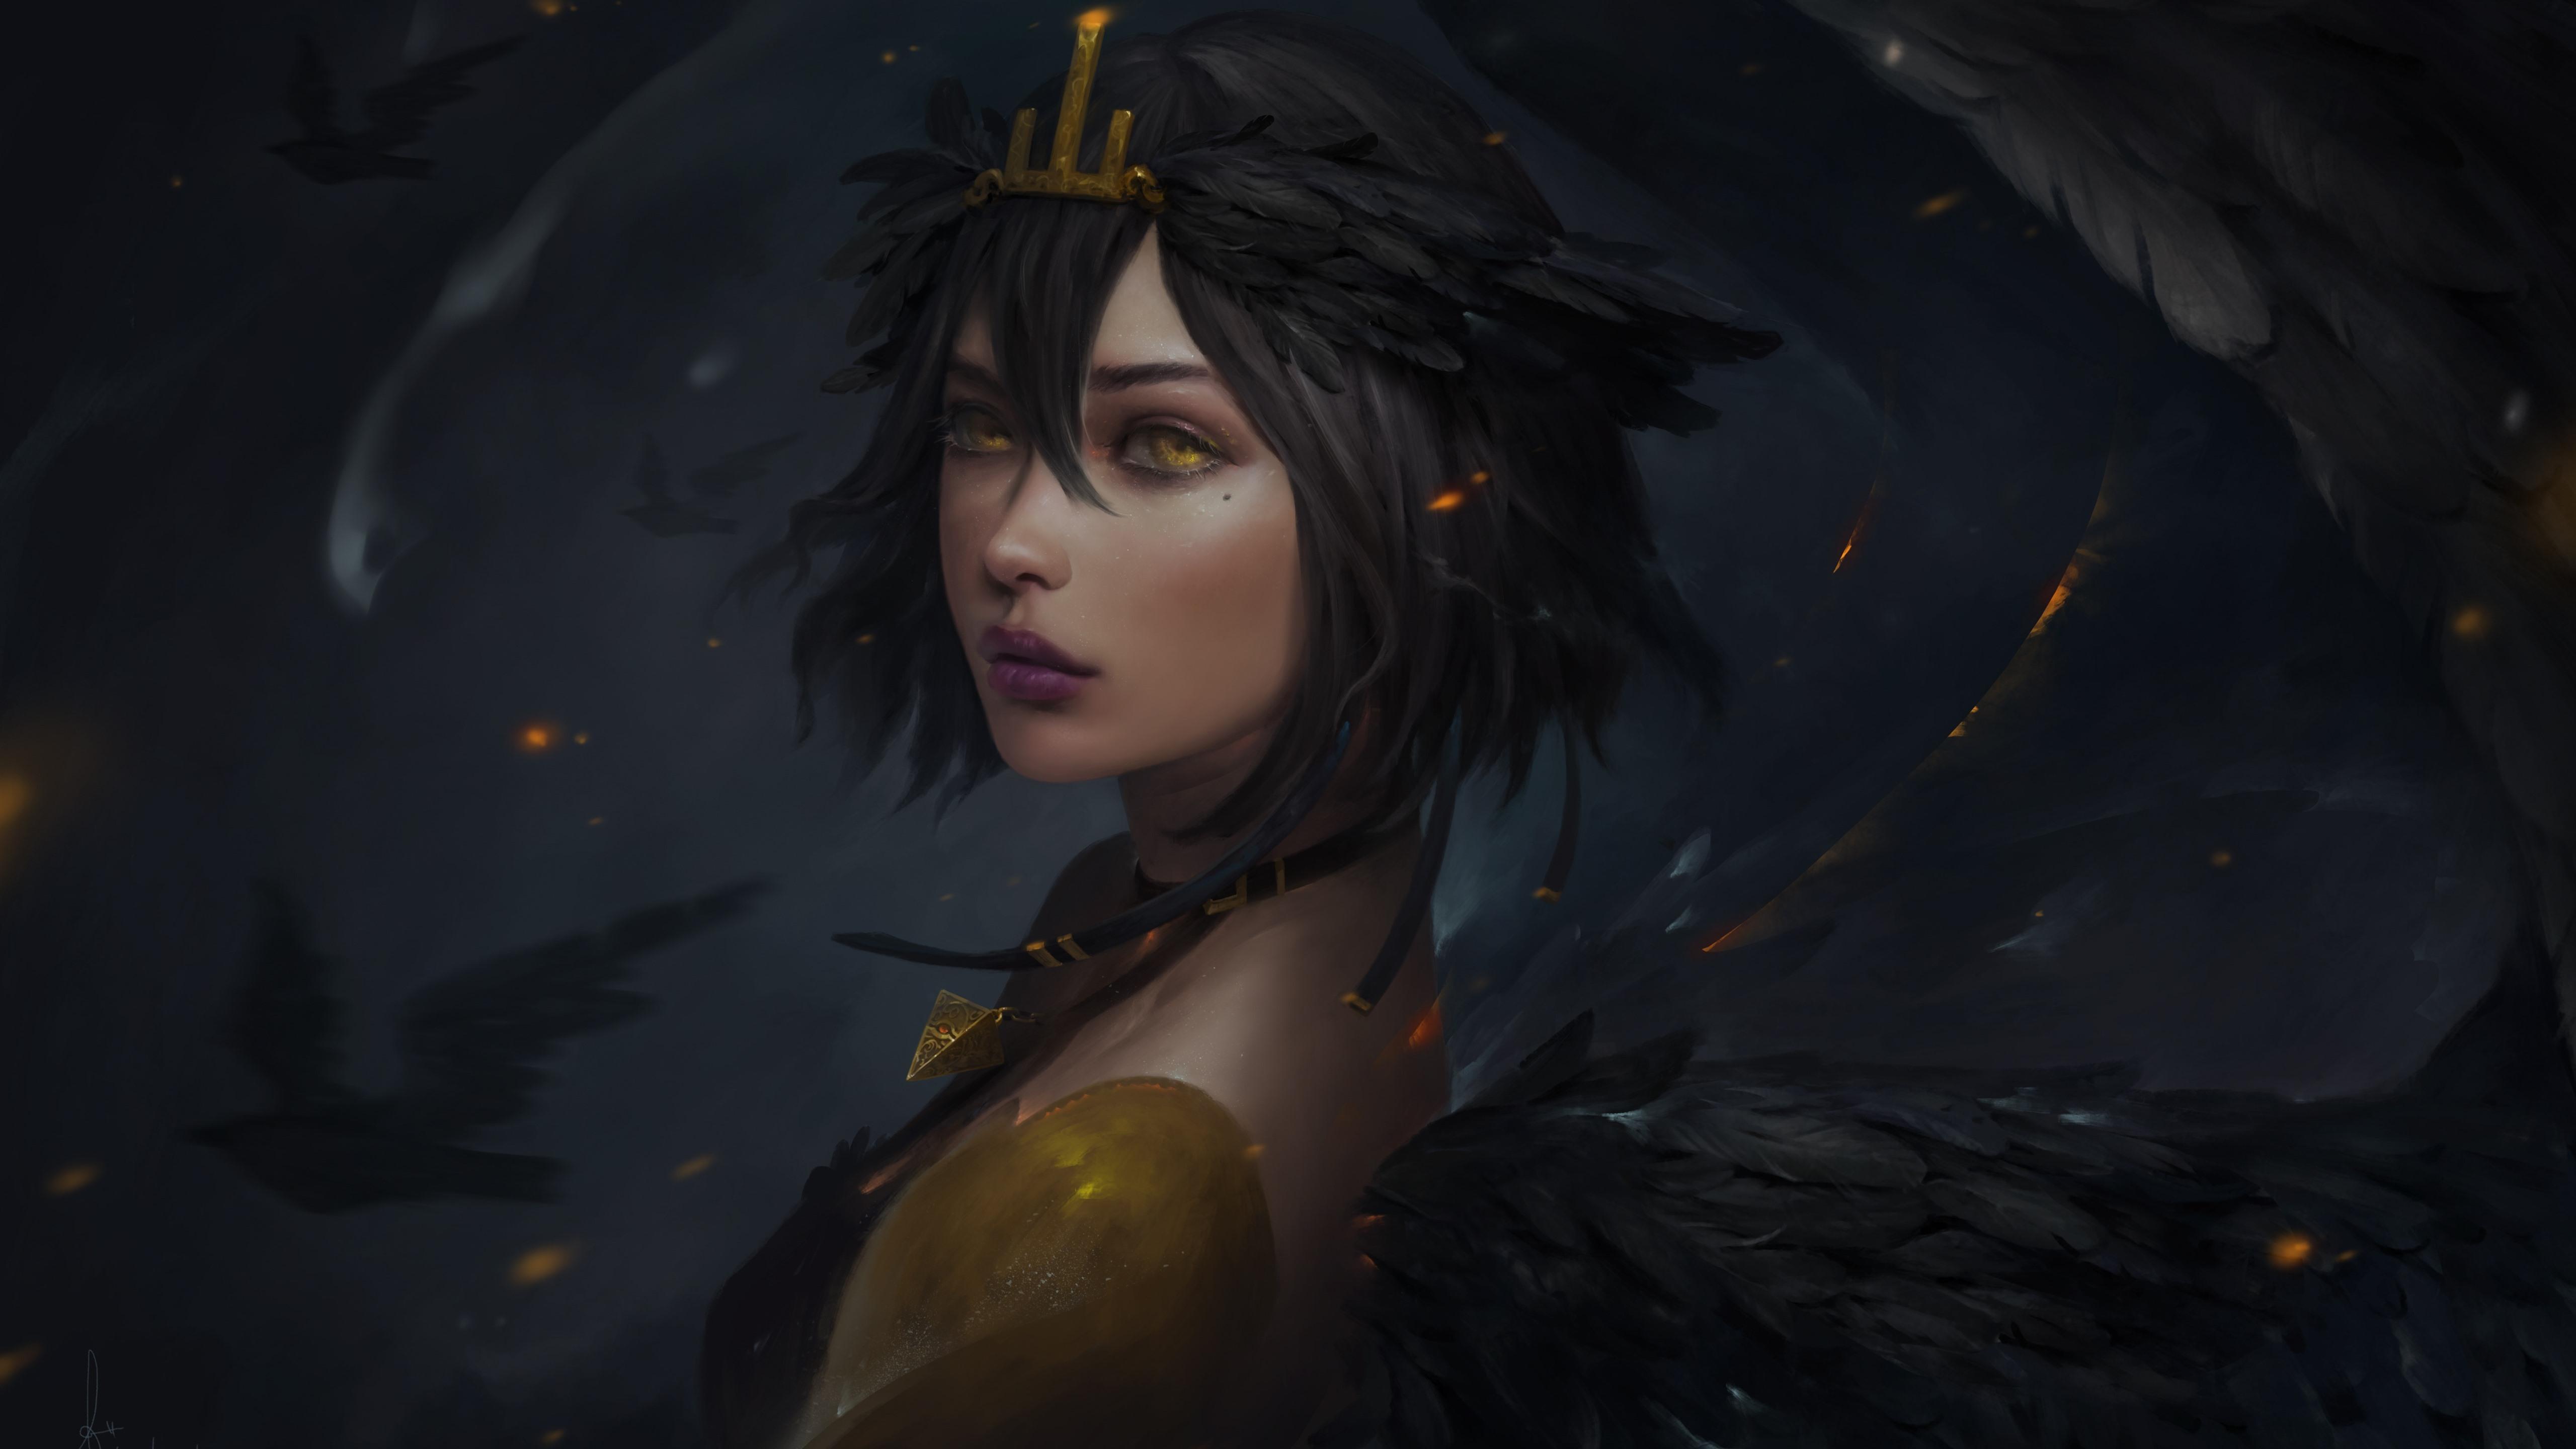 Fantasy Digital Art Woman 512 X 512